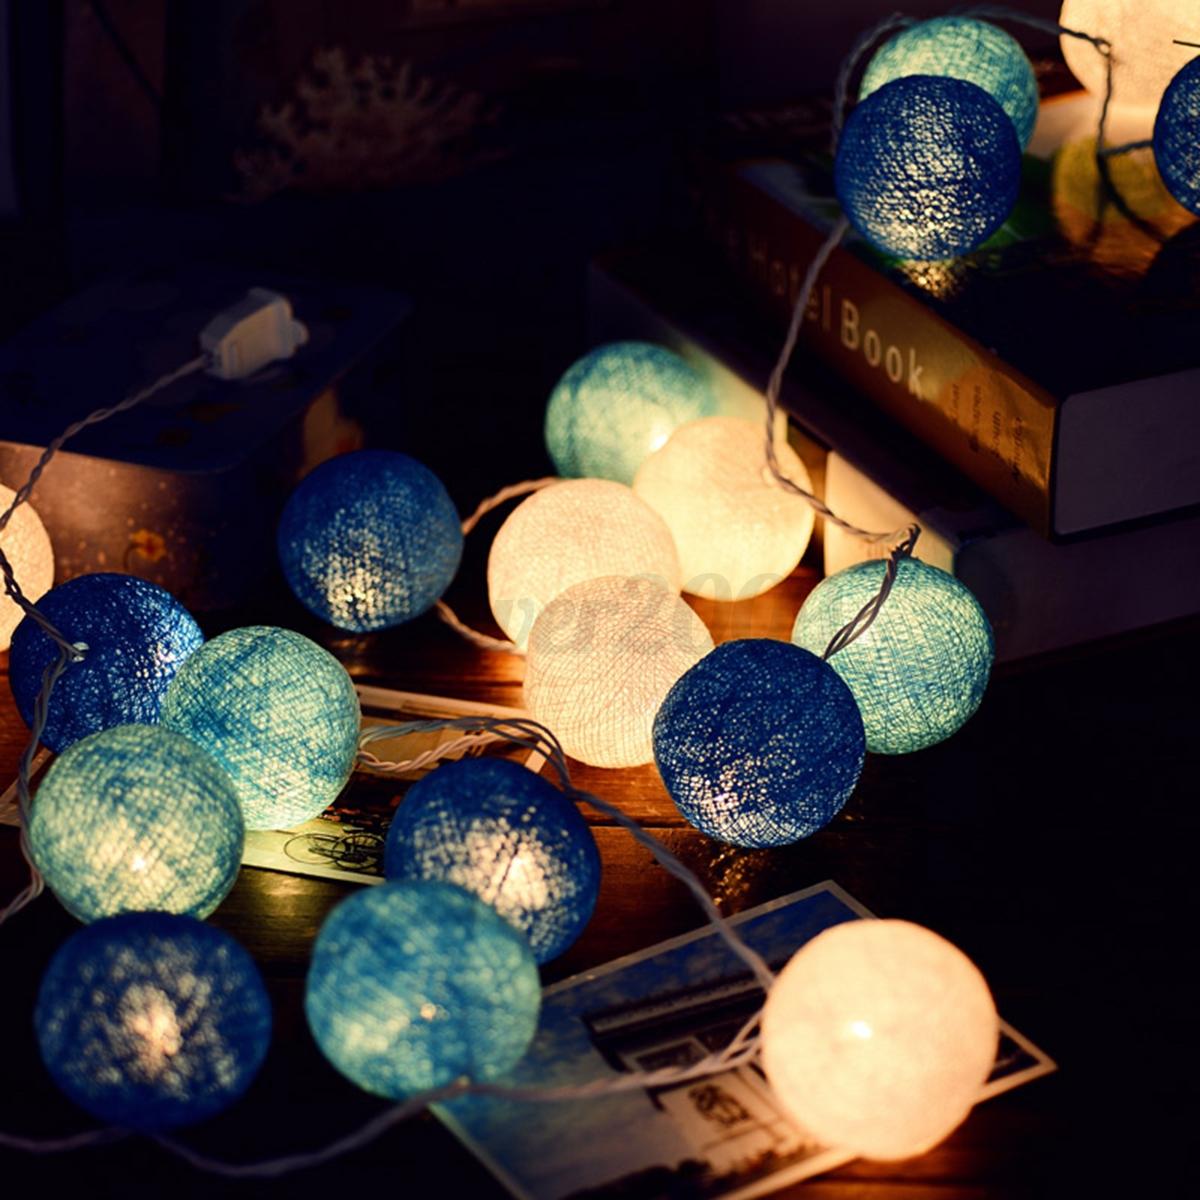 10 20 30 cotton ball leds string fairy lights lanterns for Decor 9 iball